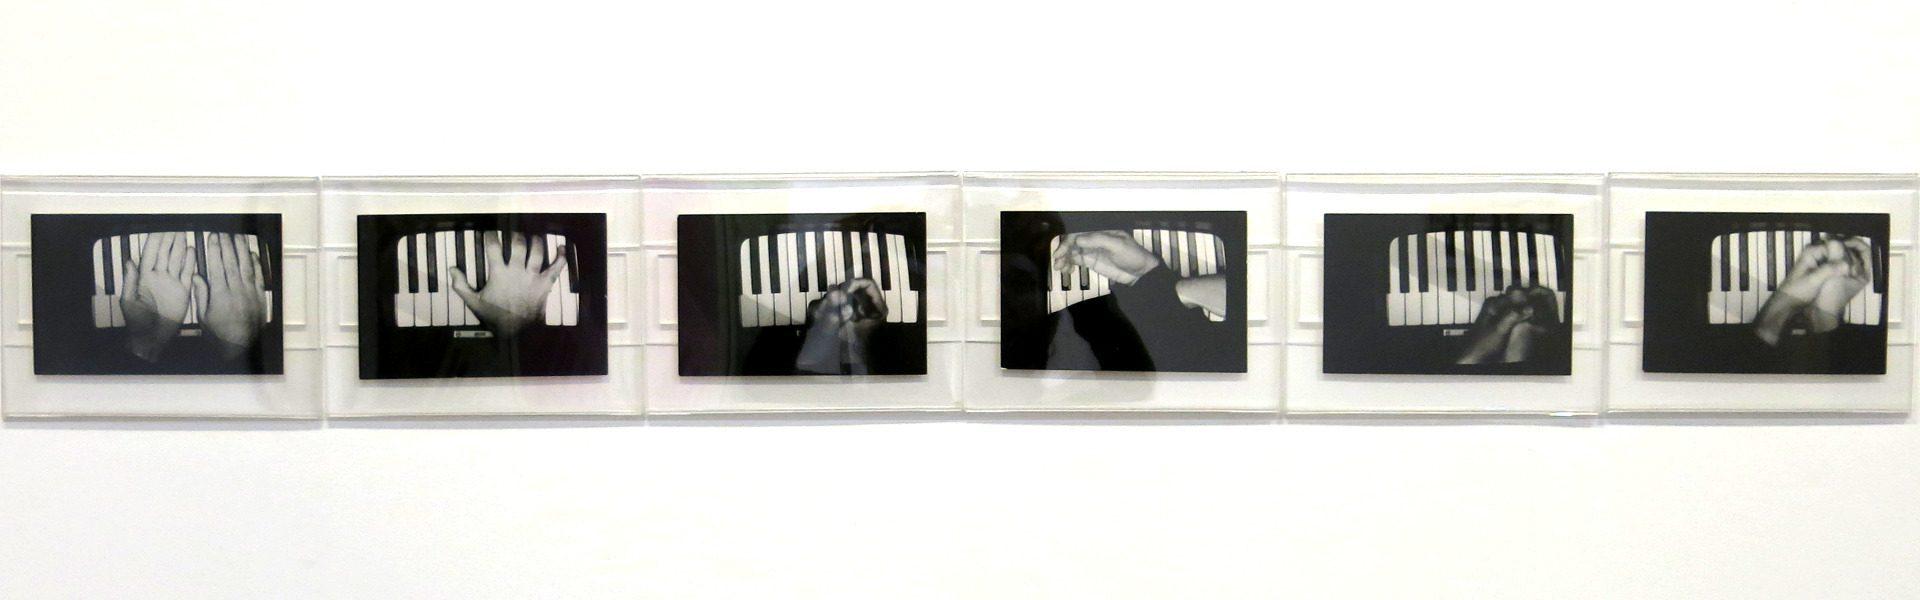 Giuseppe Chiari, PentaChiari, 2017, galleria Il Ponte_banner_2